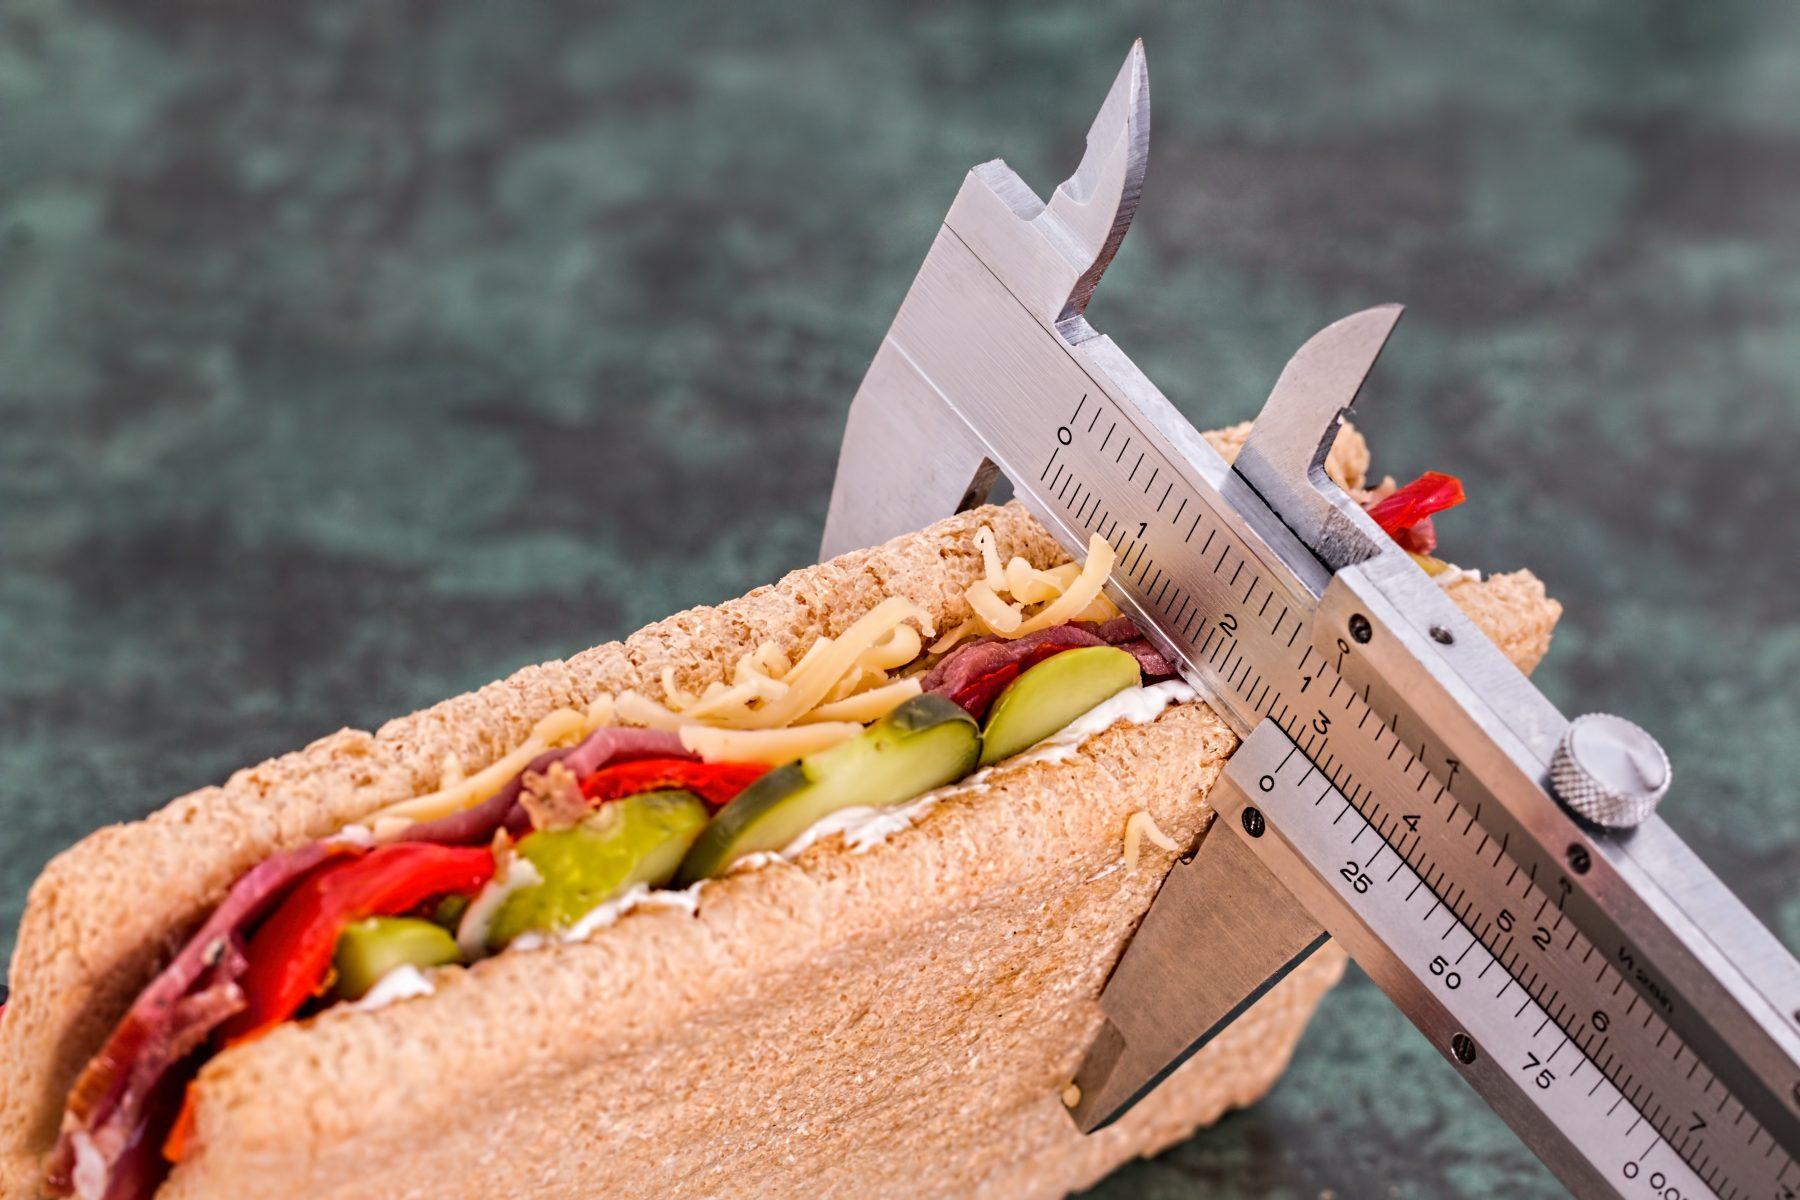 Voedingscentrum niet blij met razend populair Pioppi-dieet en dit is waarom